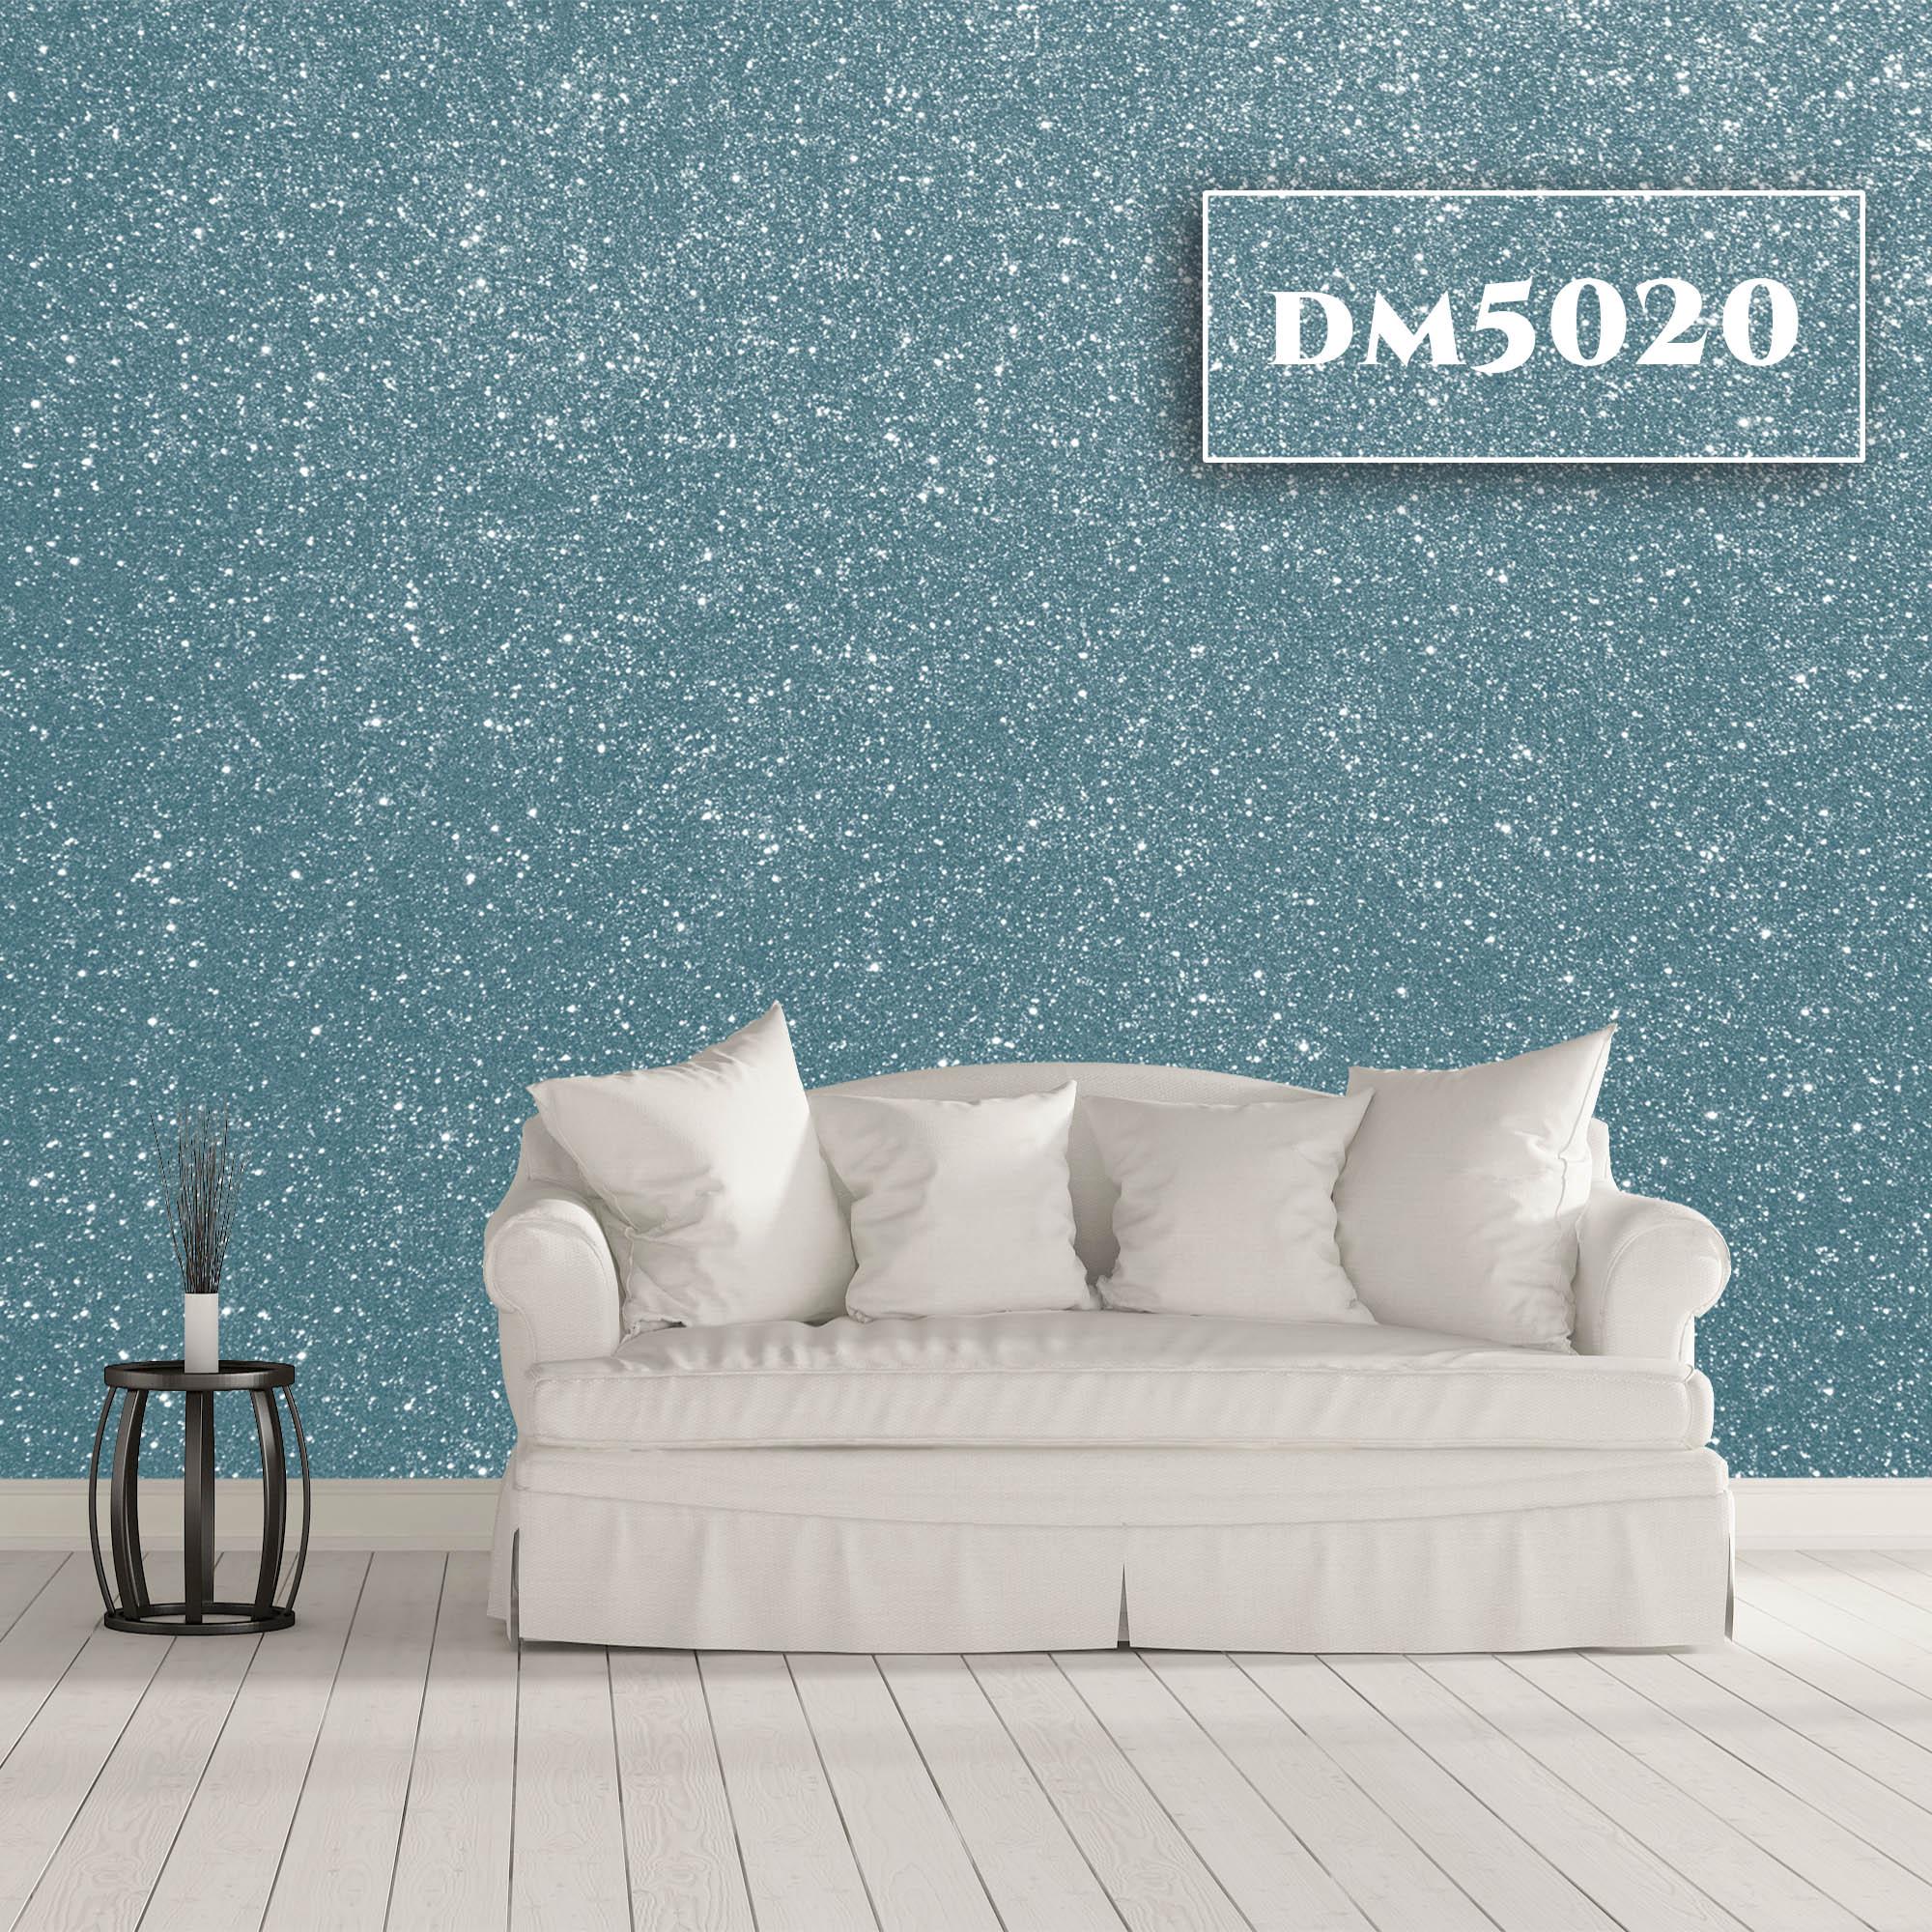 DM5020